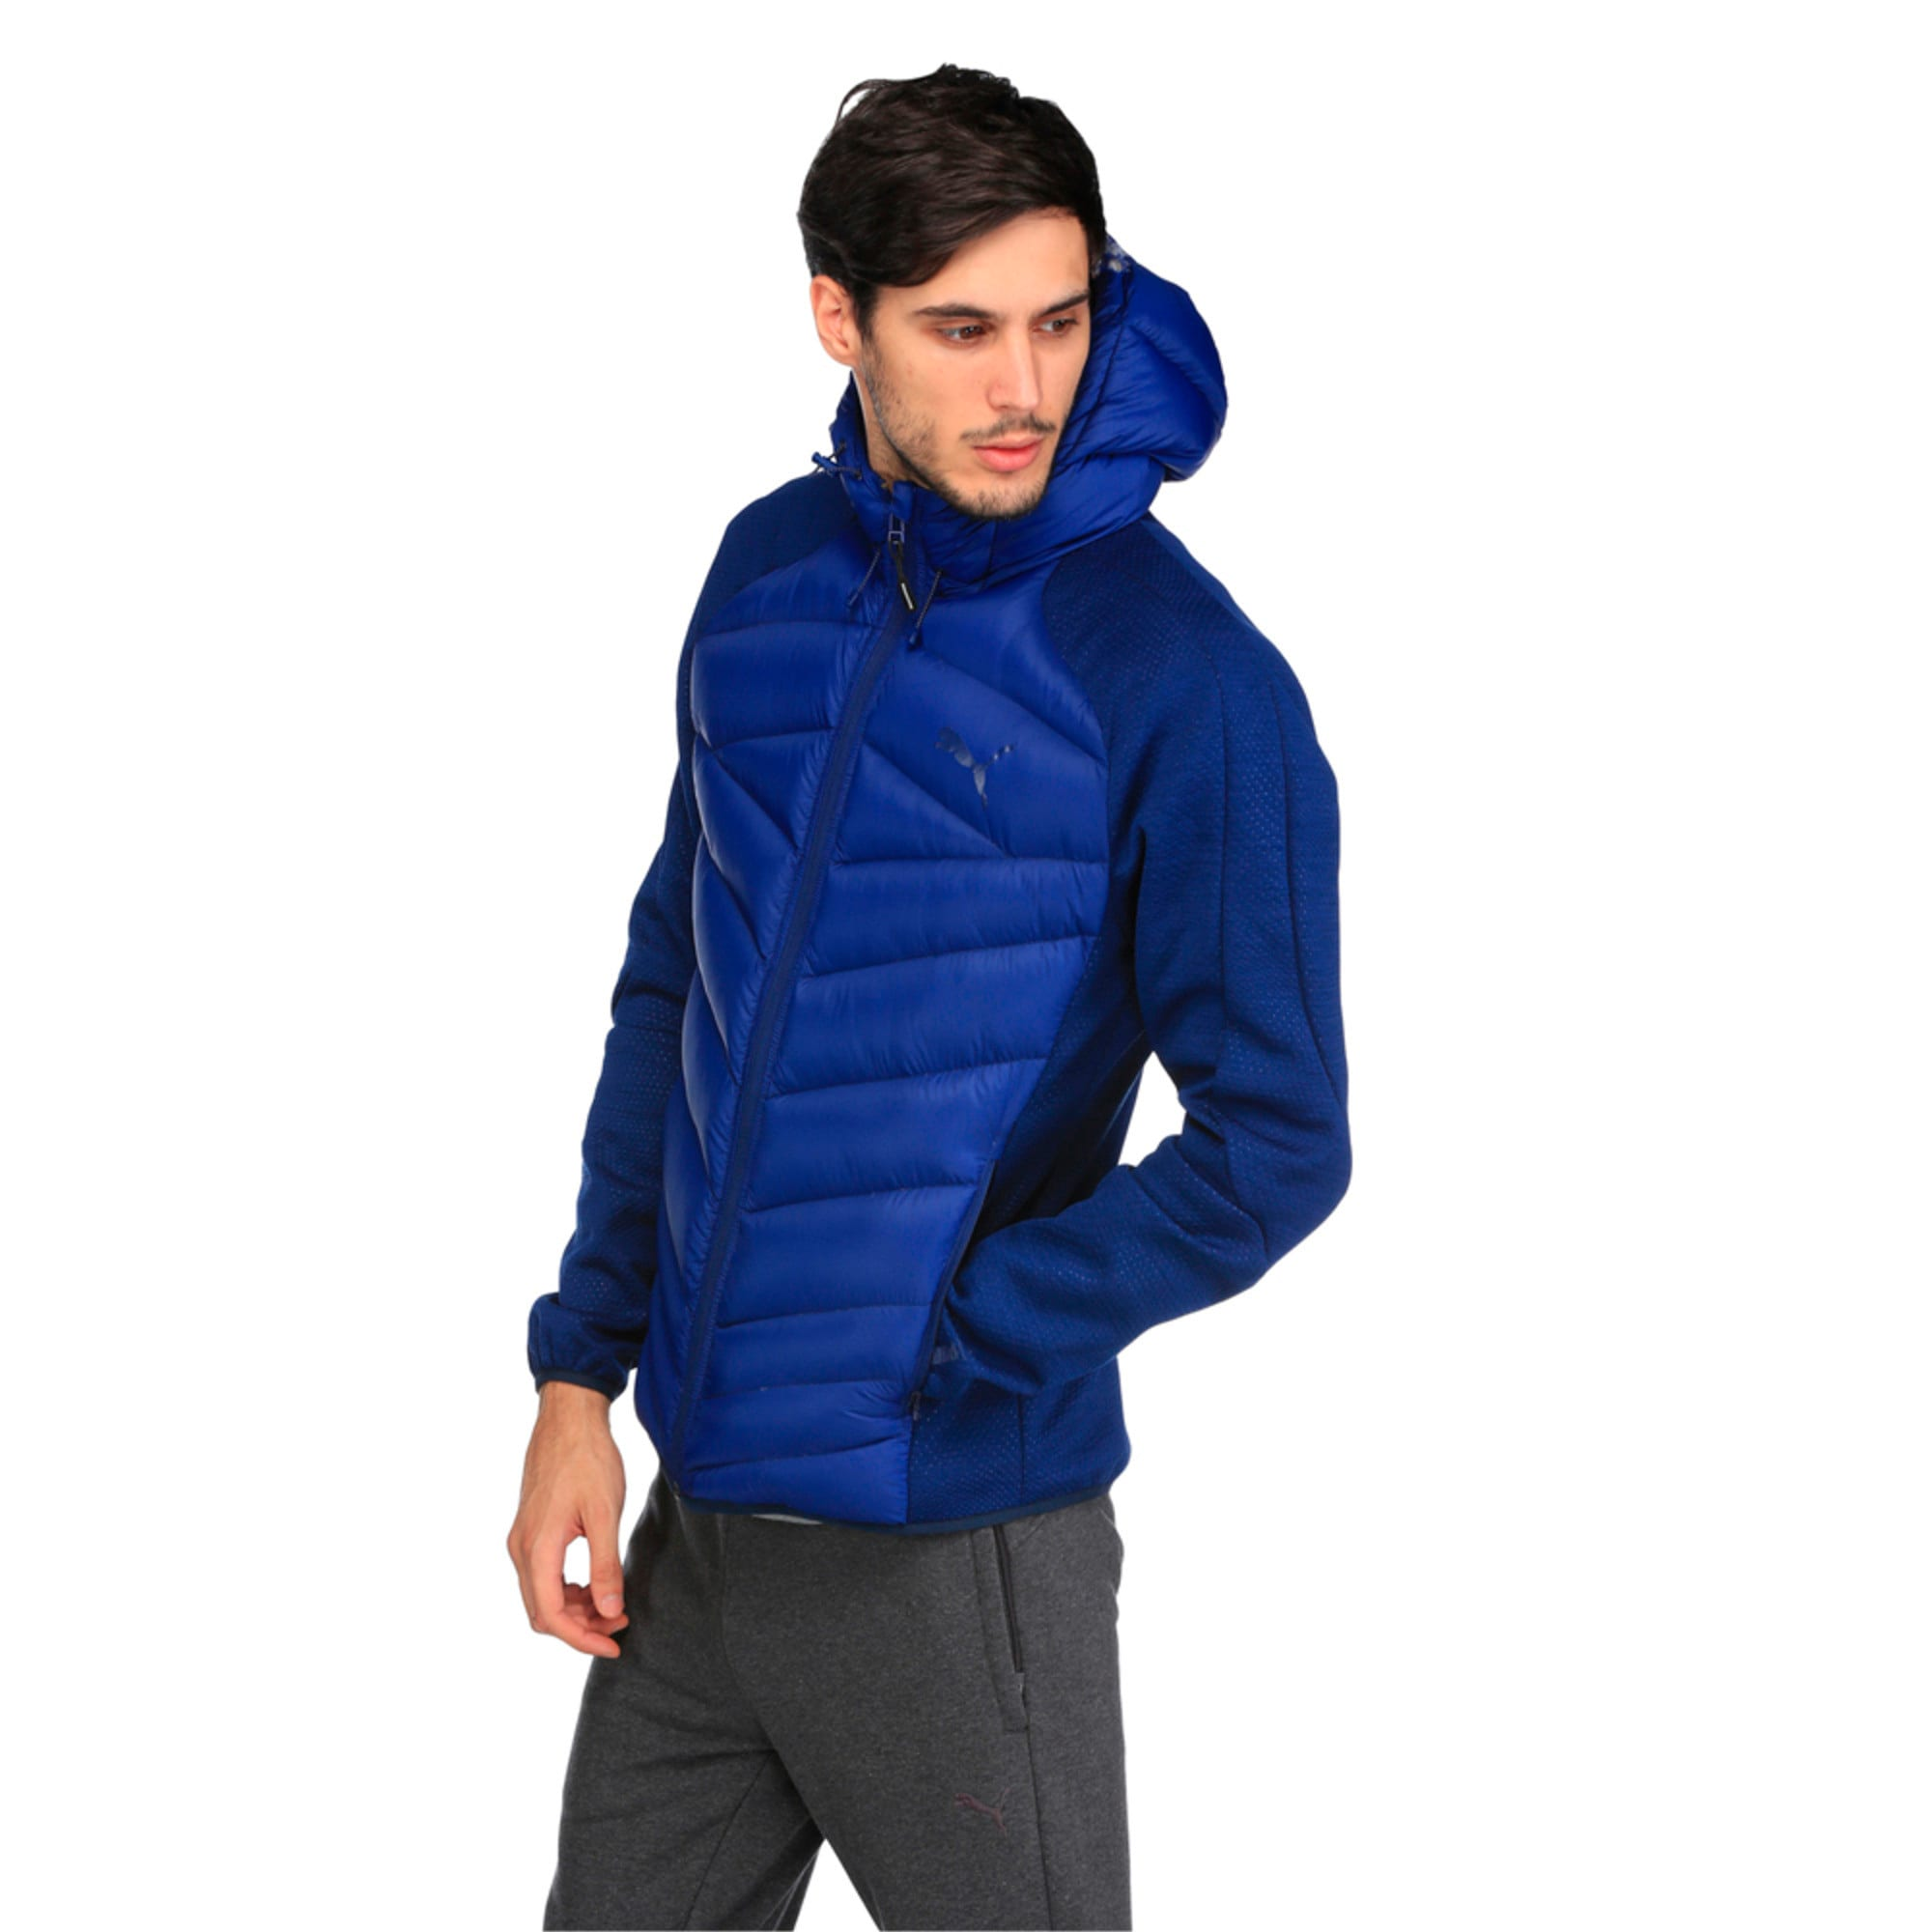 Thumbnail 2 of Double Knit Hybrid 600 Down Men's Jacket, Blue Heather-Blue Depths, medium-IND